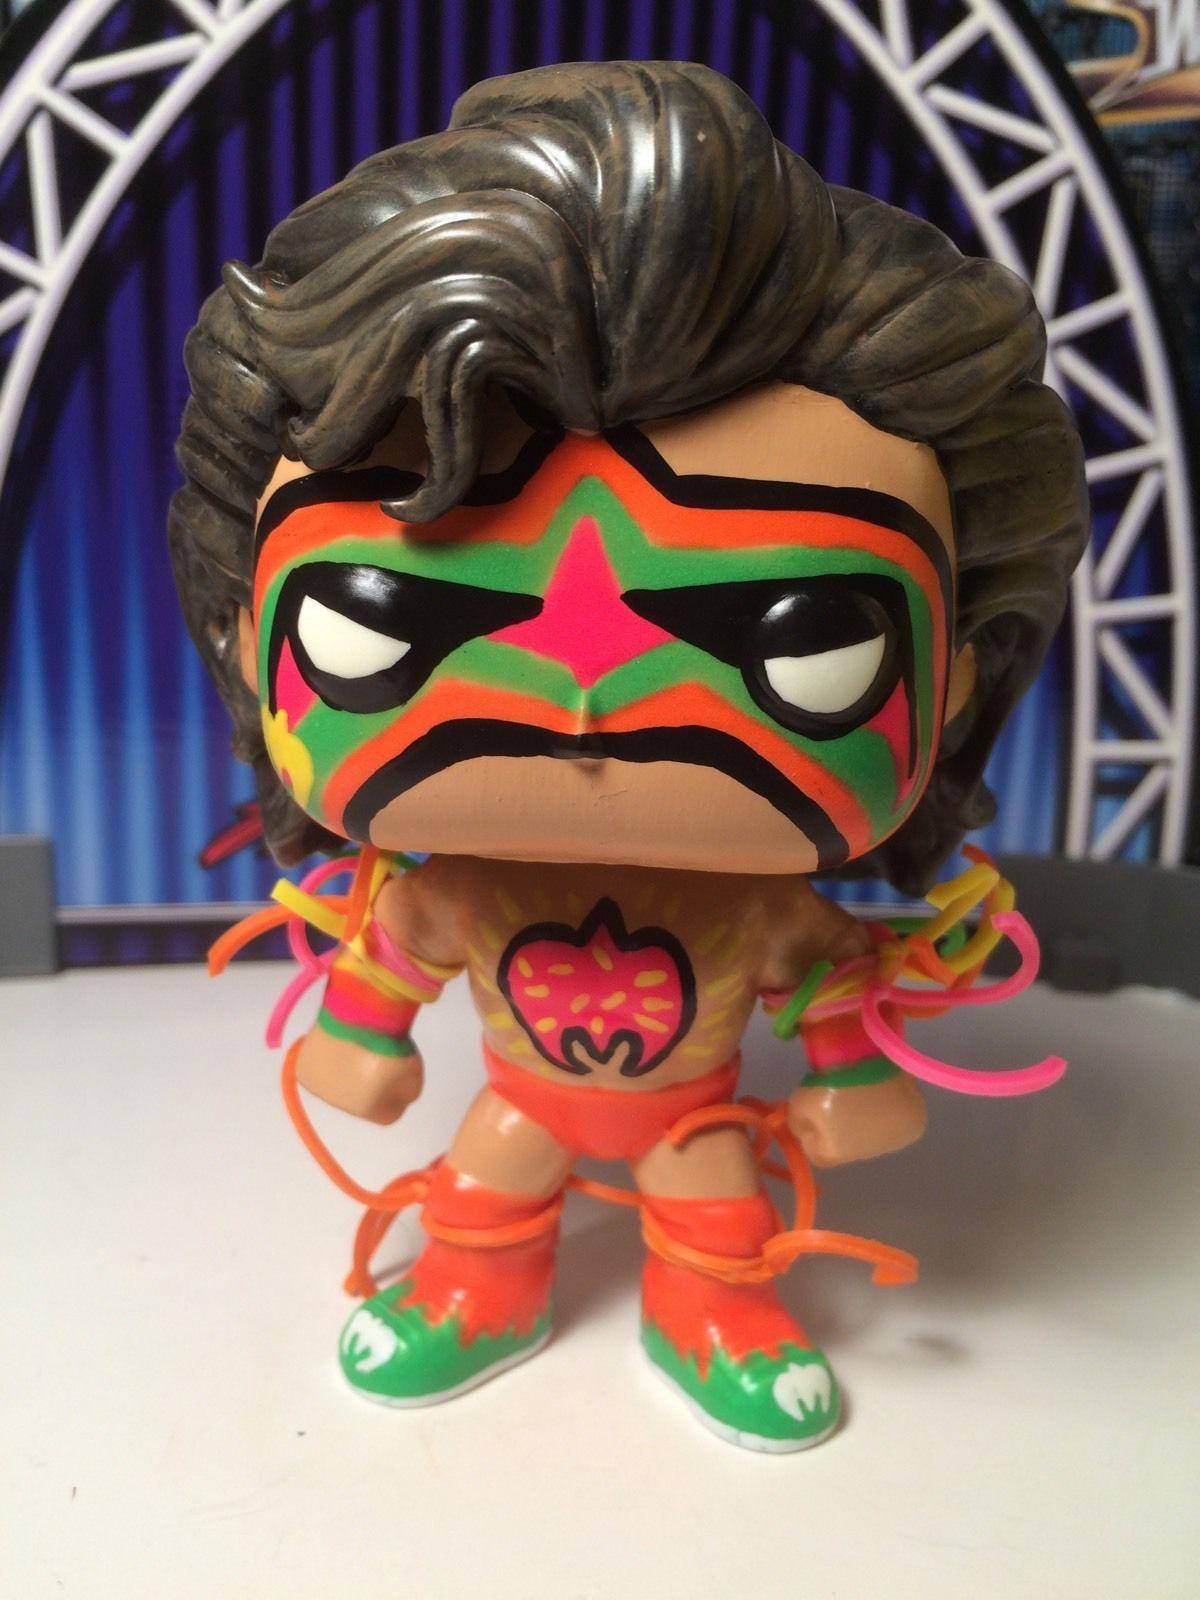 Details About Wwe Wrestling Funko Pop Ultimate Warrior